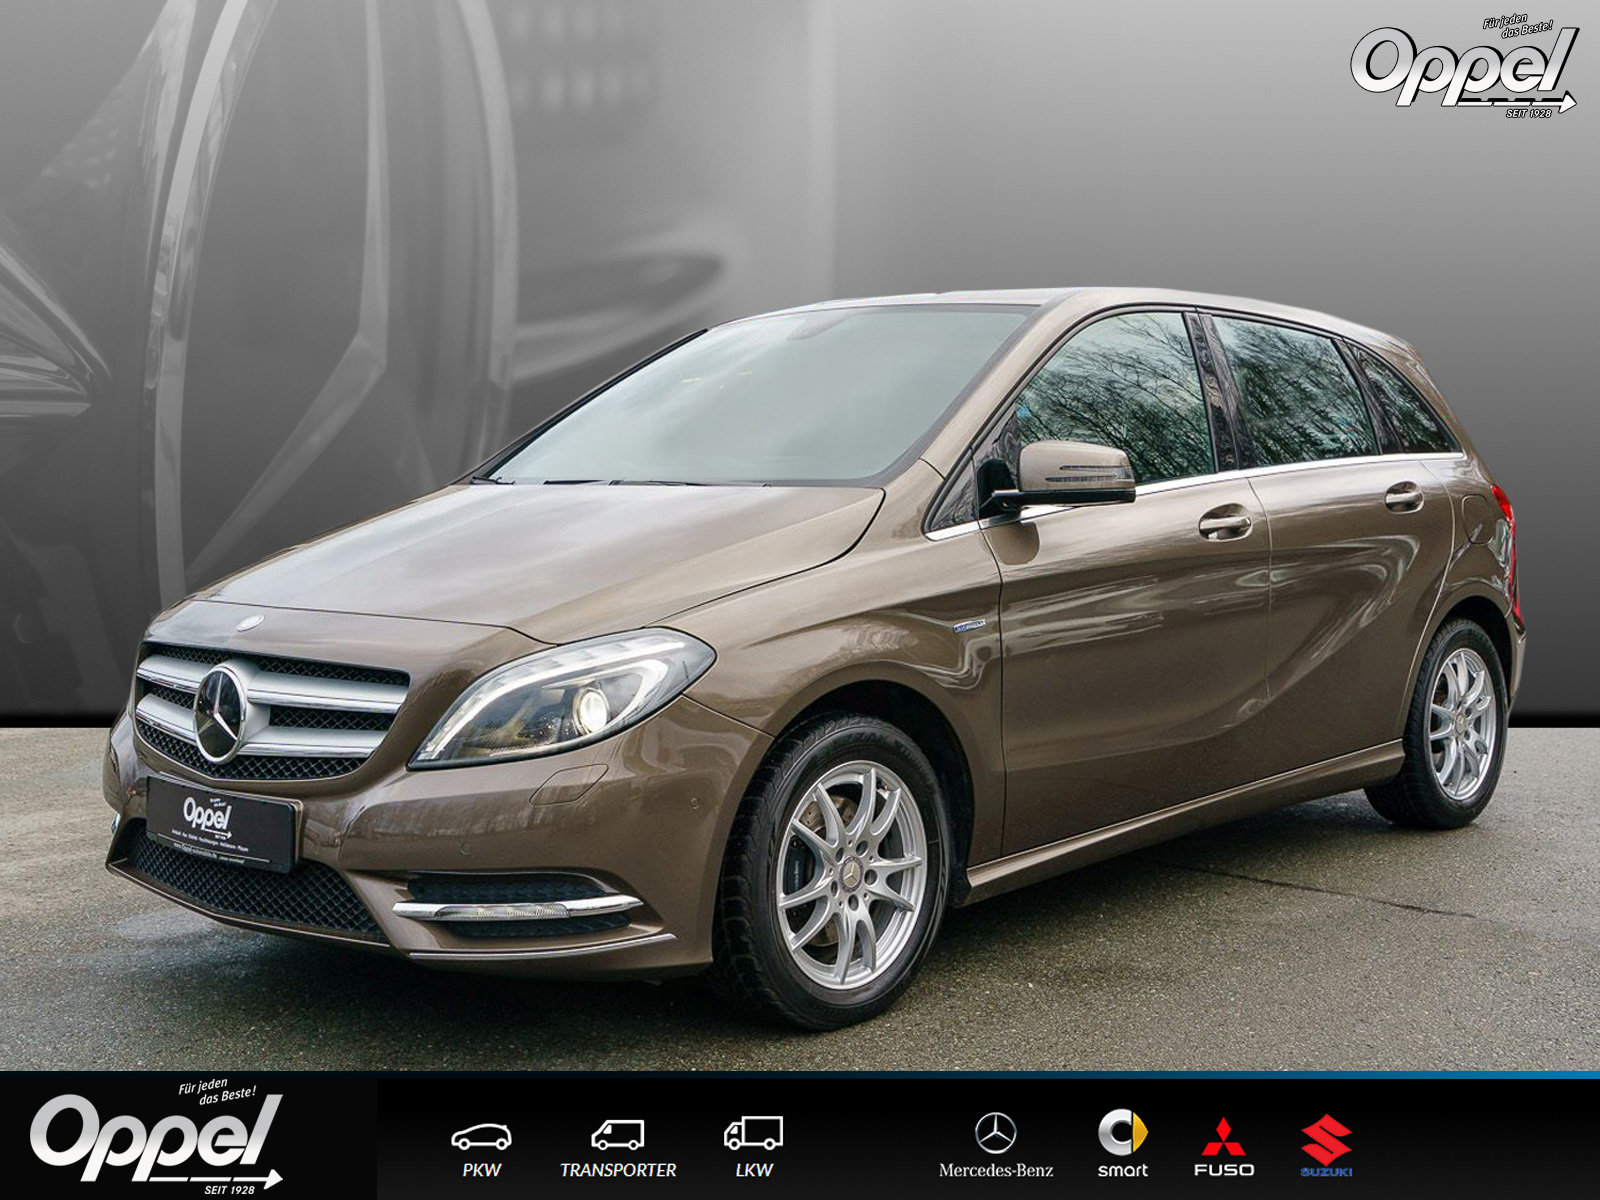 Mercedes-Benz B 200 +Klima+Parktronic+Kamera+Navi+SH+LM+Tempo+, Jahr 2012, petrol